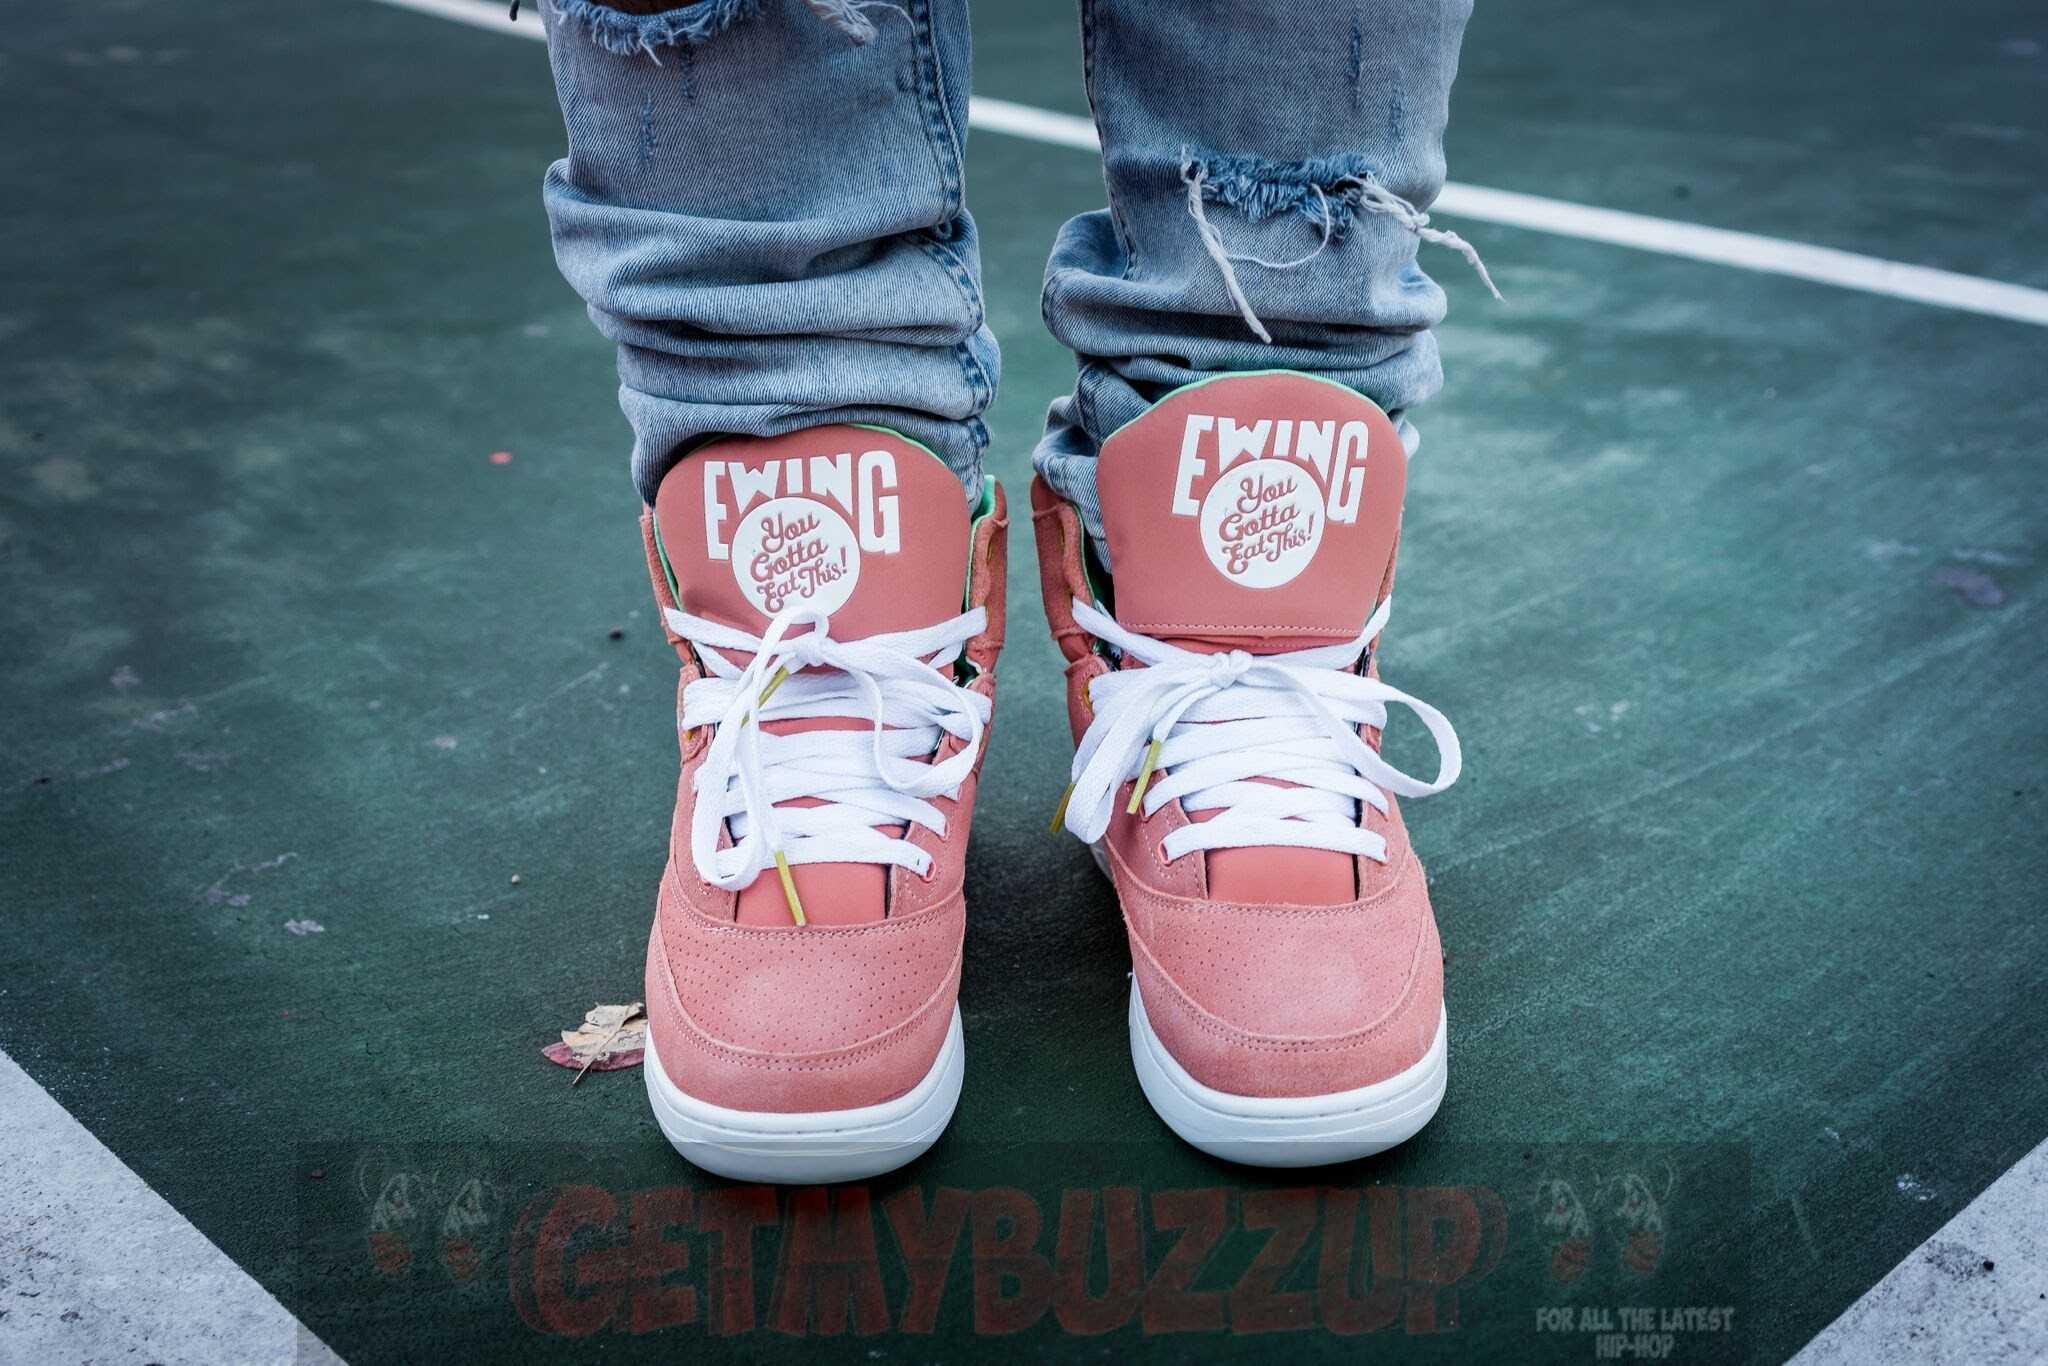 Bun B and Premium Pete to launch new Ewing 33 hi at HTown Sneaker Summit December 3 [Sneakers]